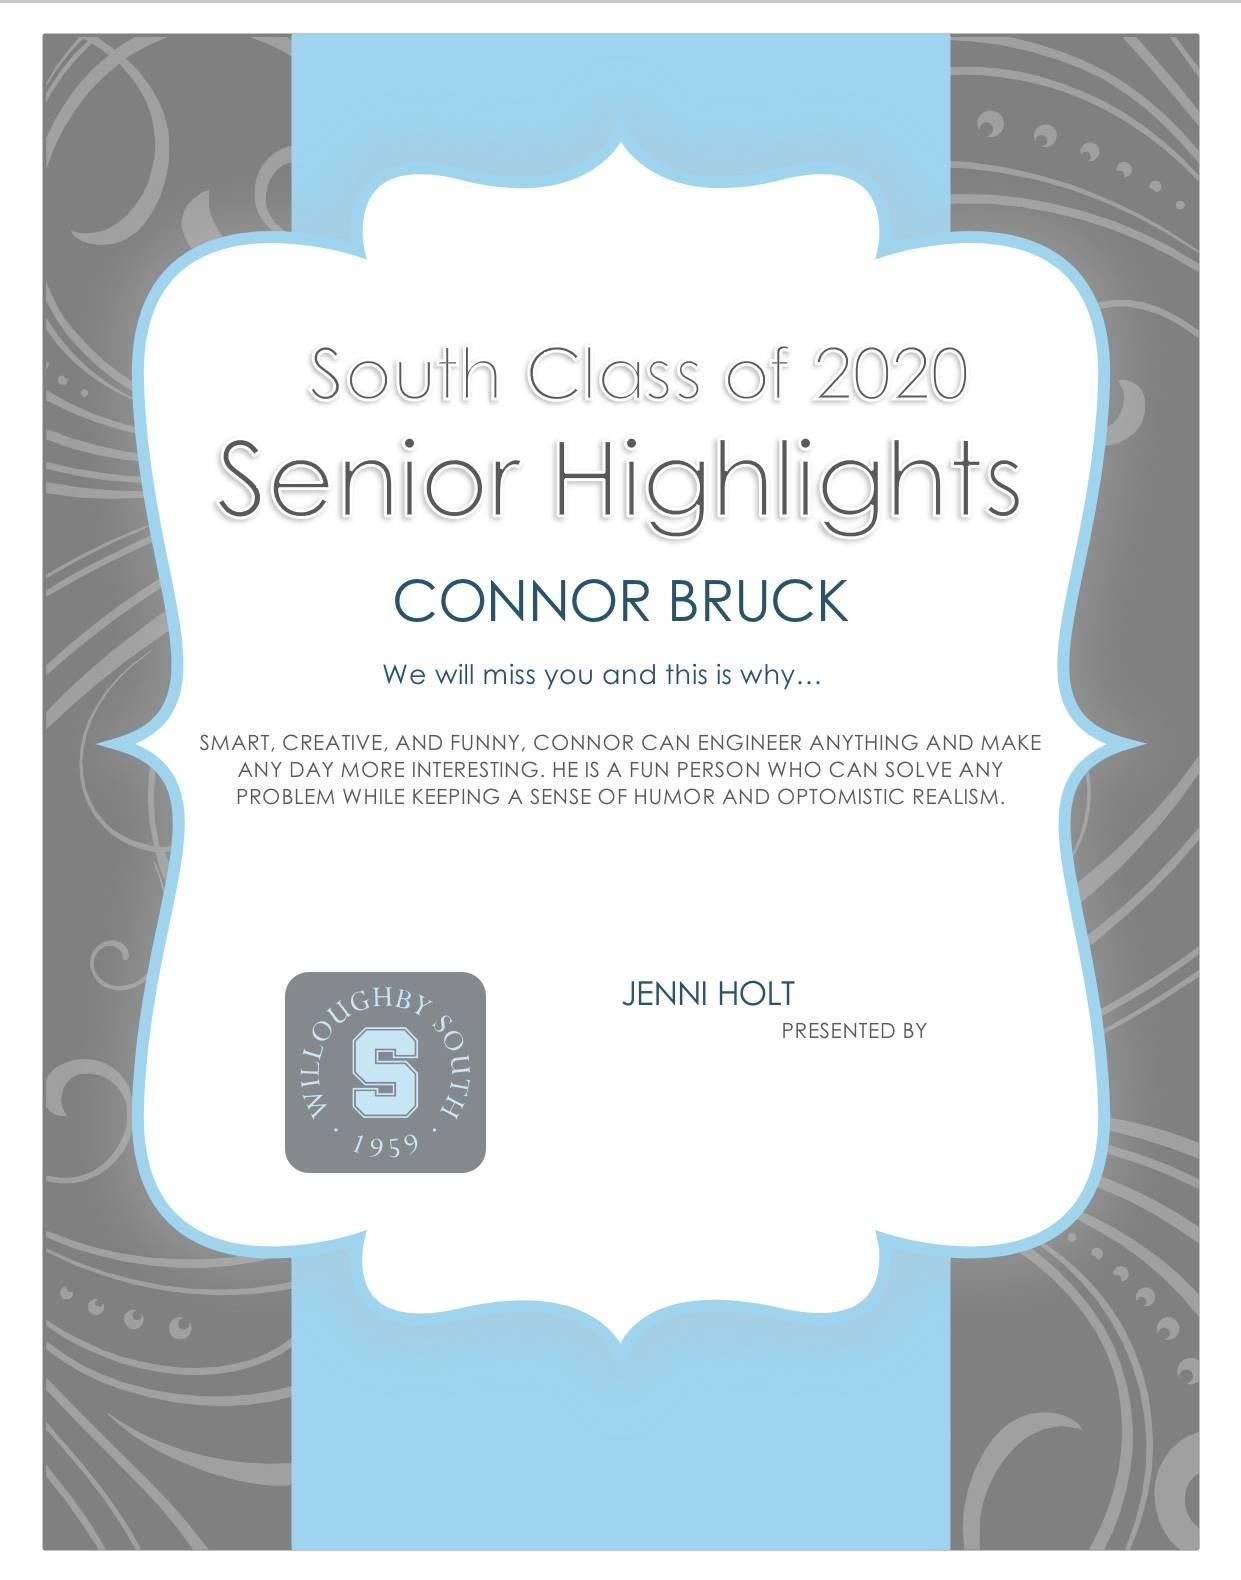 Connor Bruck